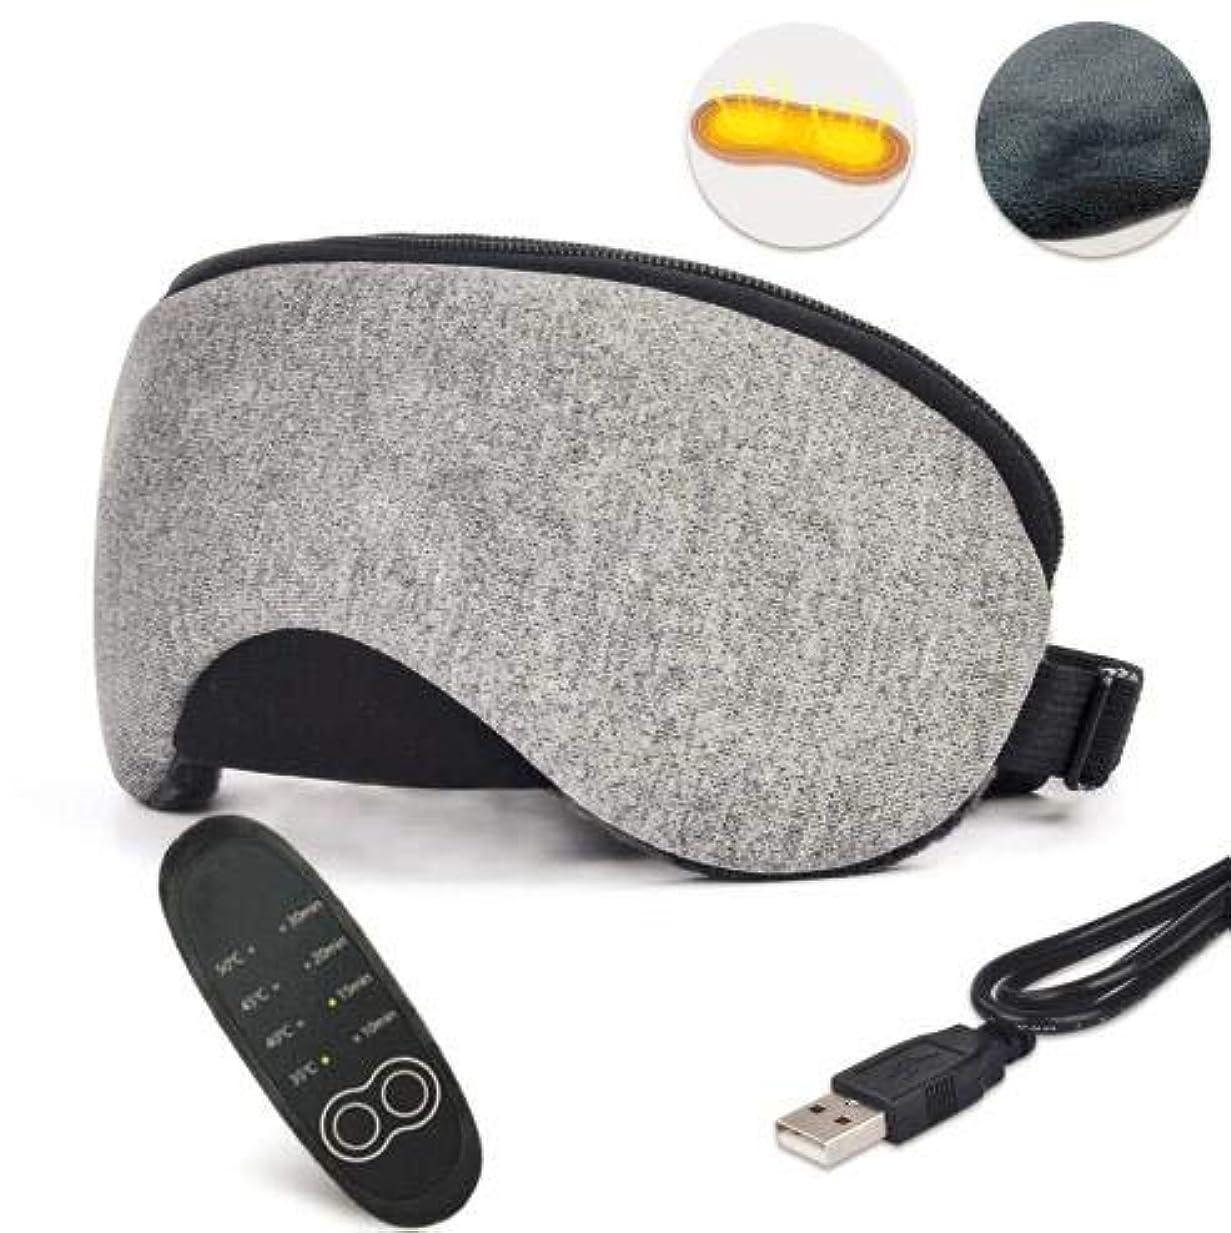 NOTE Usbortable 3dスリープアイマスクカバー援助睡眠目隠しusb加熱綿表面アイマスク用睡眠SPAソフト調整可能包帯